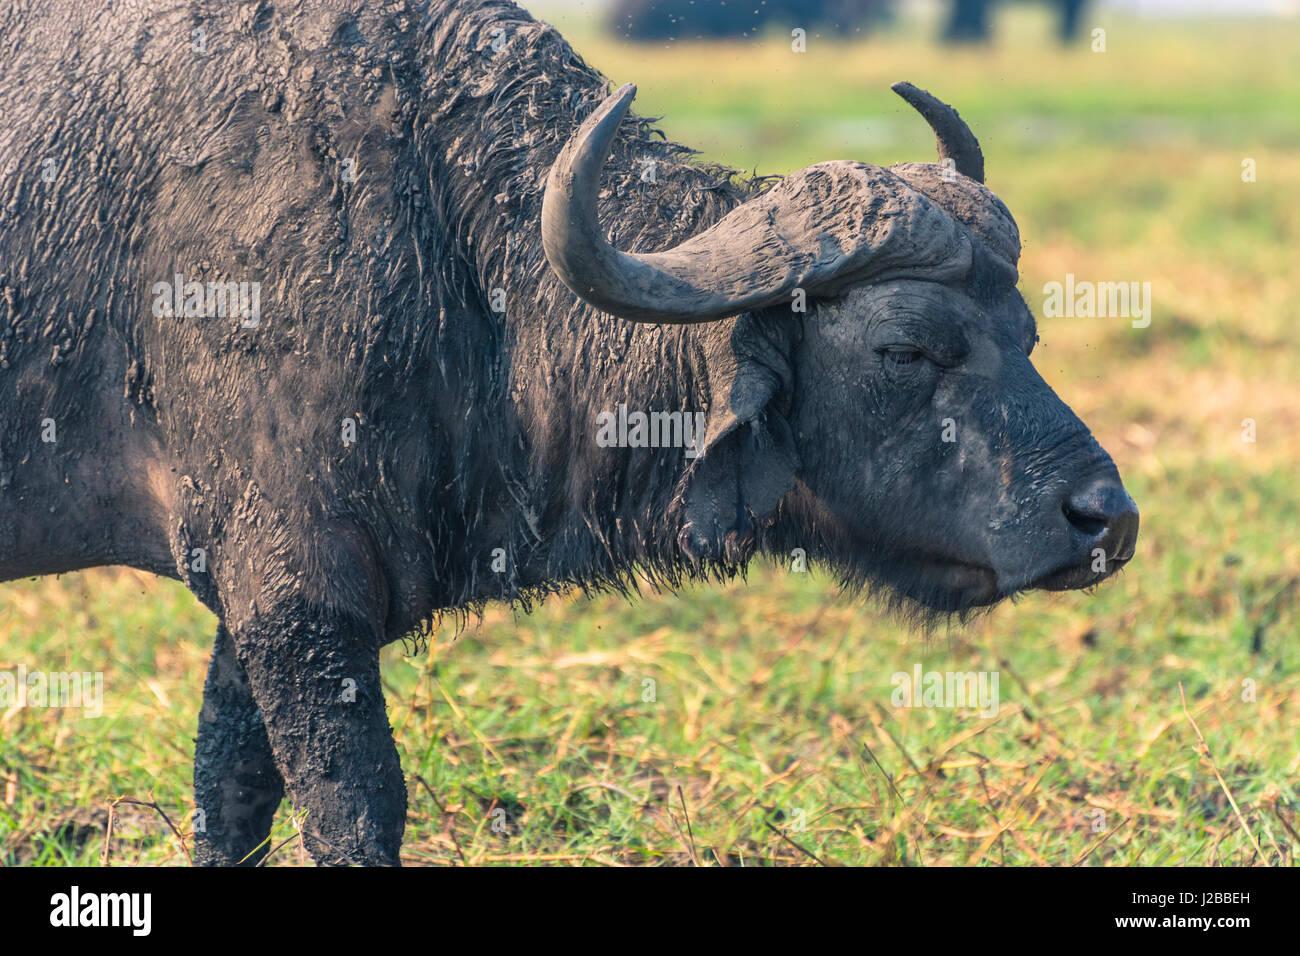 Botswana. Chobe National Park. Alte männliche Kaffernbüffel (Syncerus Caffer) am Ufer des Chobe Flusses. Stockbild